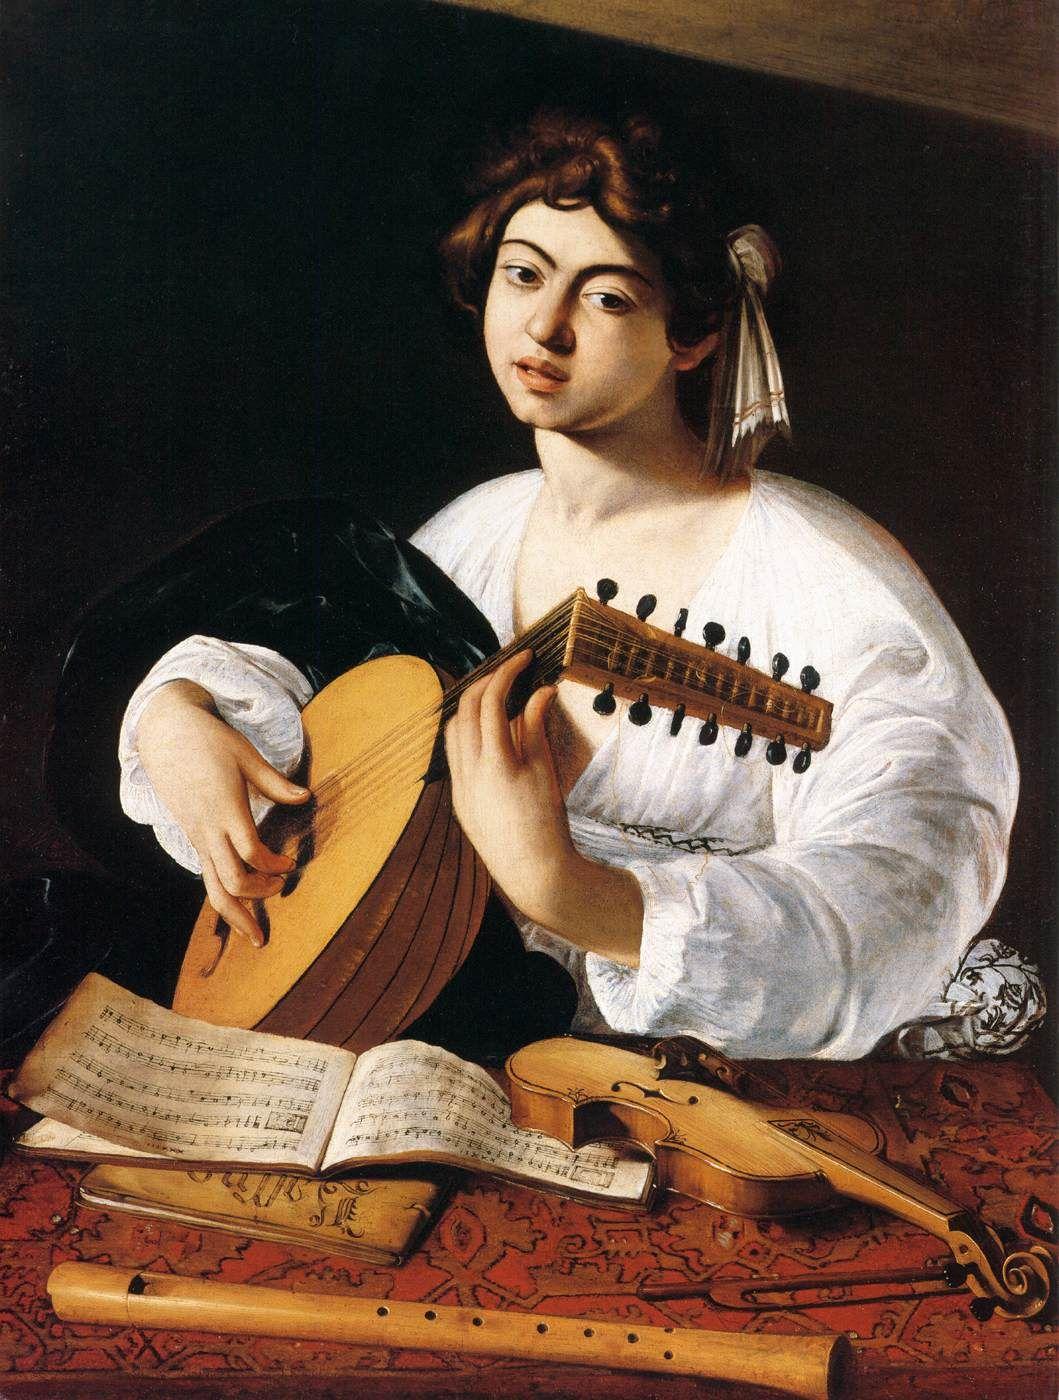 Caravaggio - Vajza qe i bie Liutes